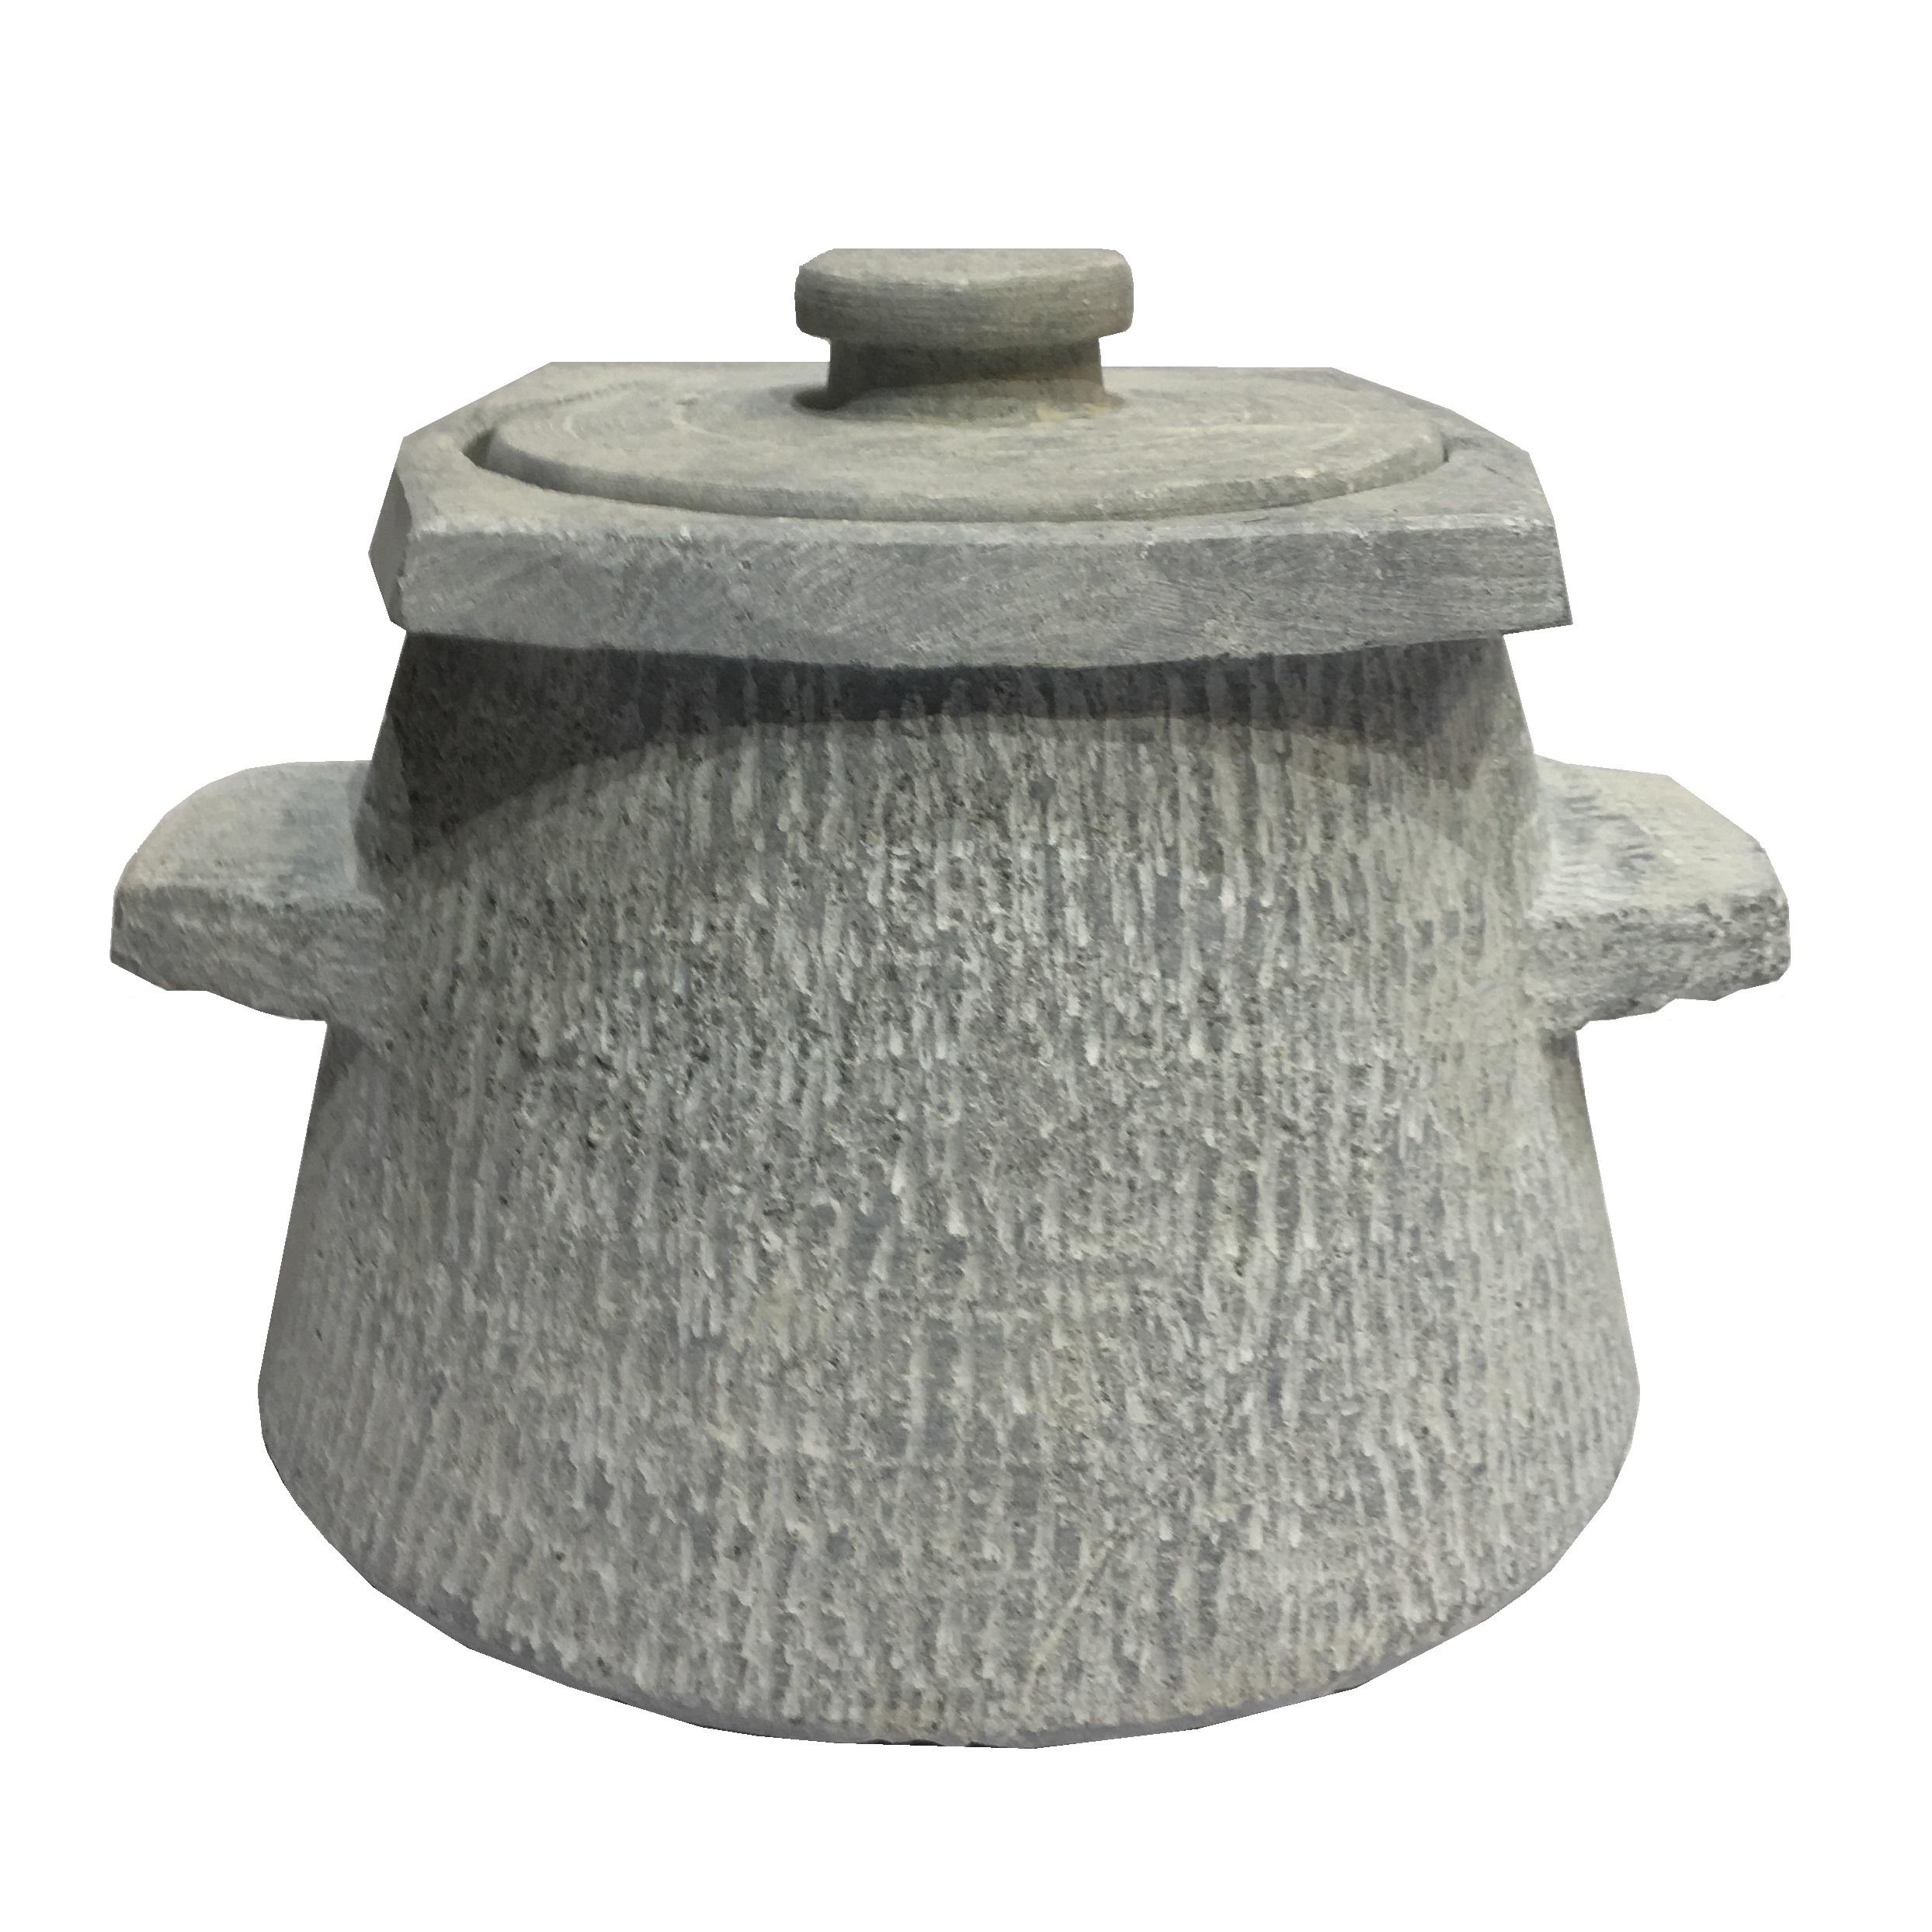 ظرف دیزی سنگی مدل تیشه ای کد DZT 1010